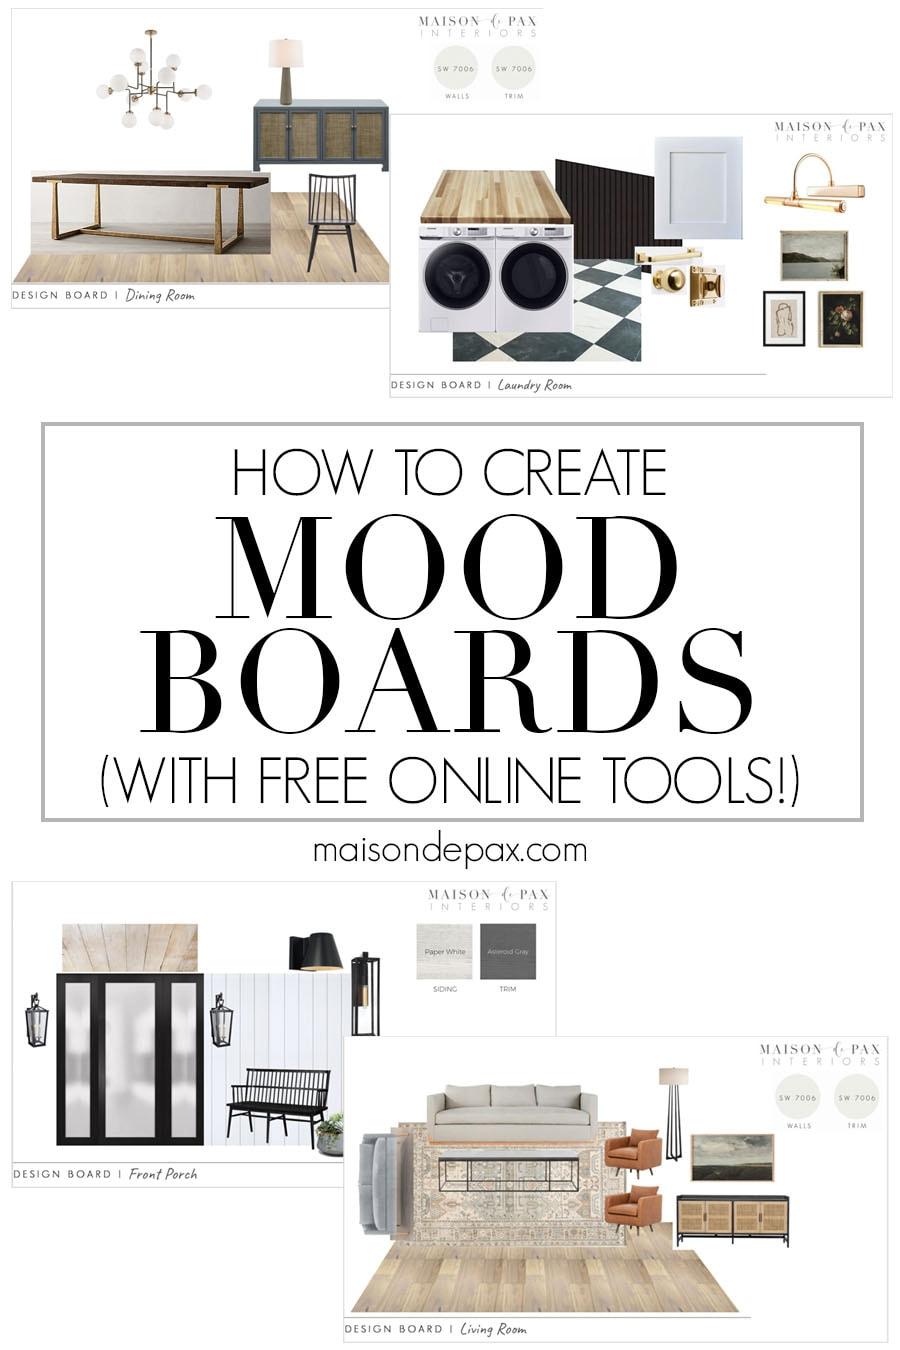 room makeover design boards and how to make them | Maison de Pax